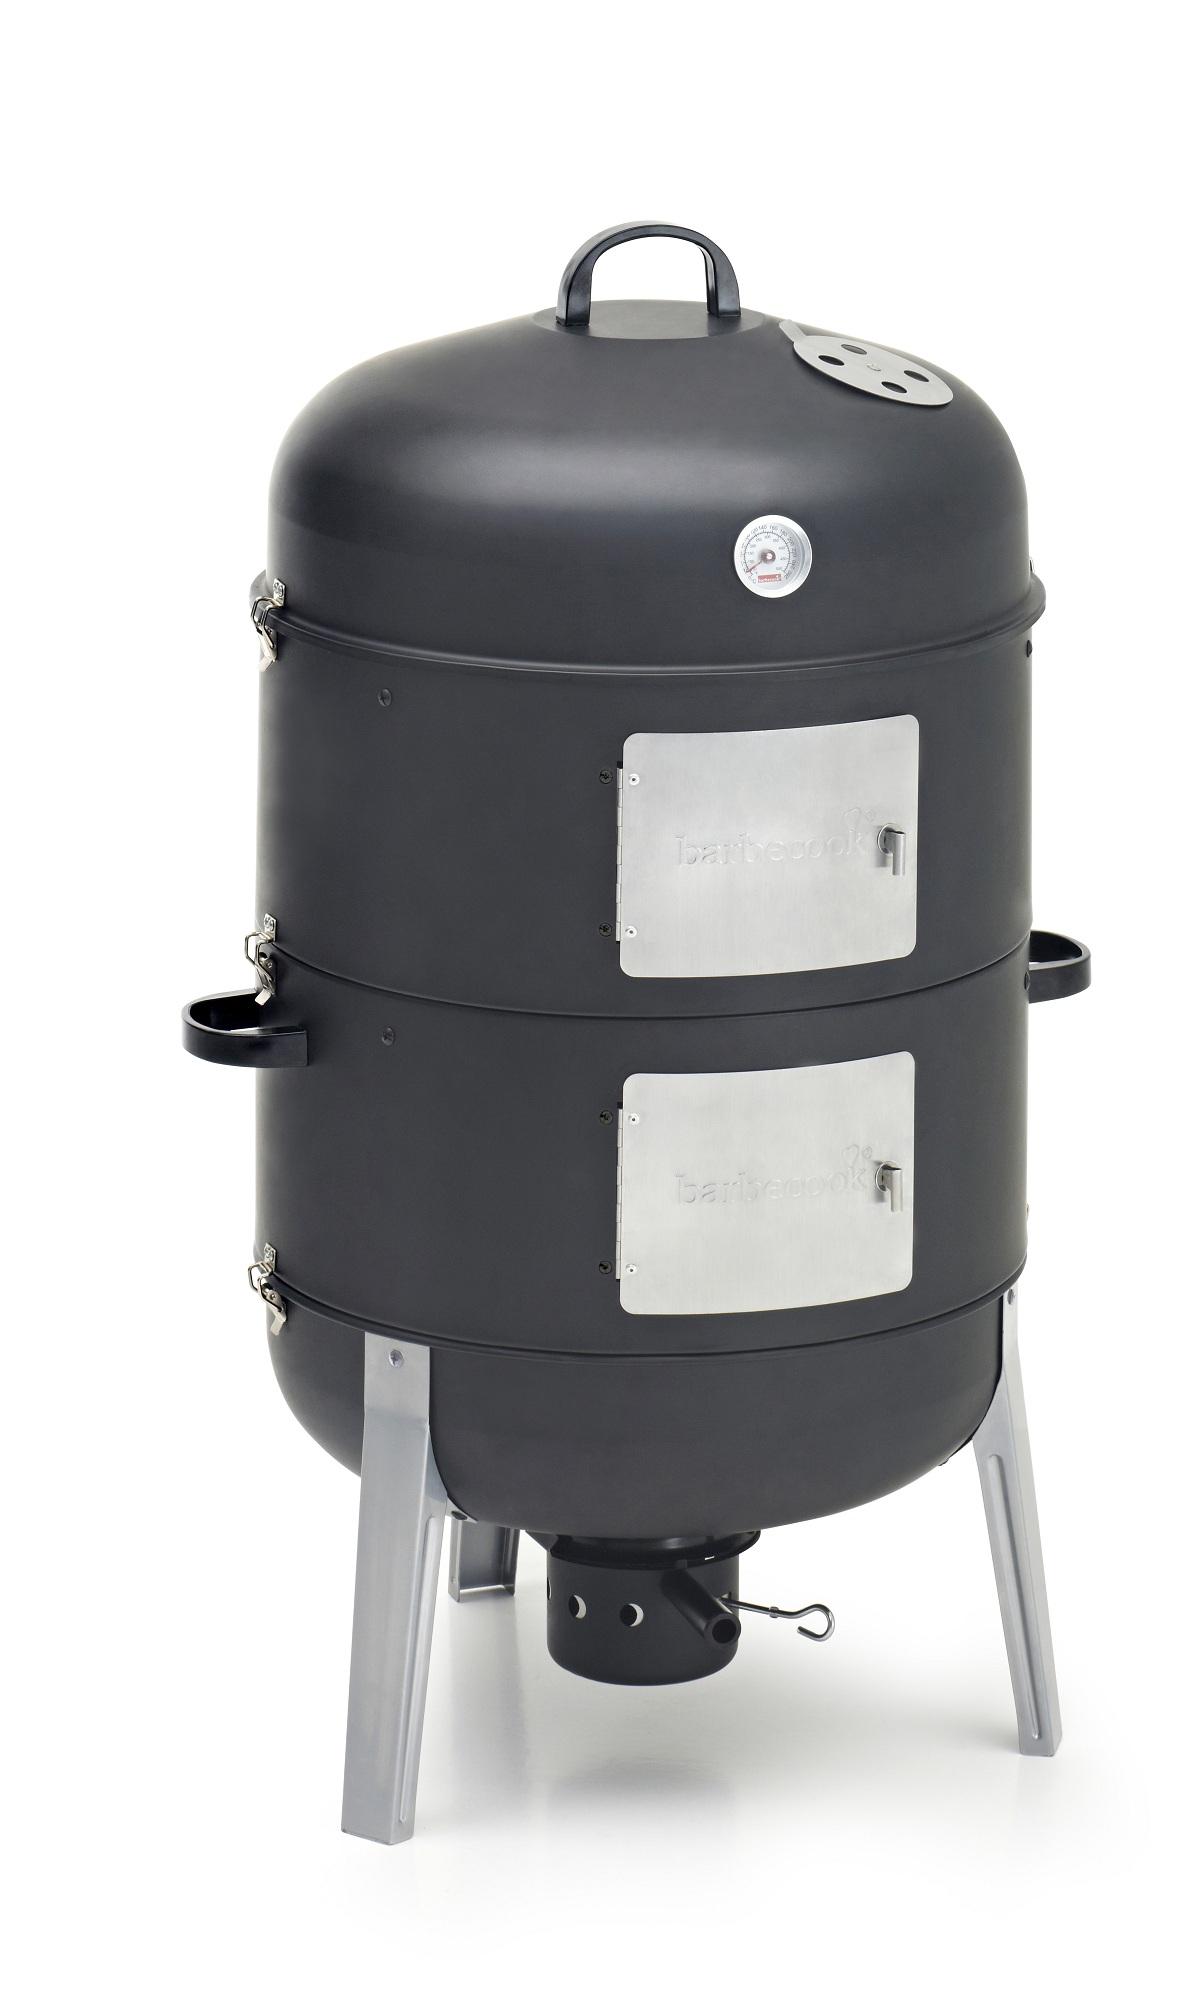 barbecook smoker xl r ucherofen kleinster mobiler gasgrill. Black Bedroom Furniture Sets. Home Design Ideas